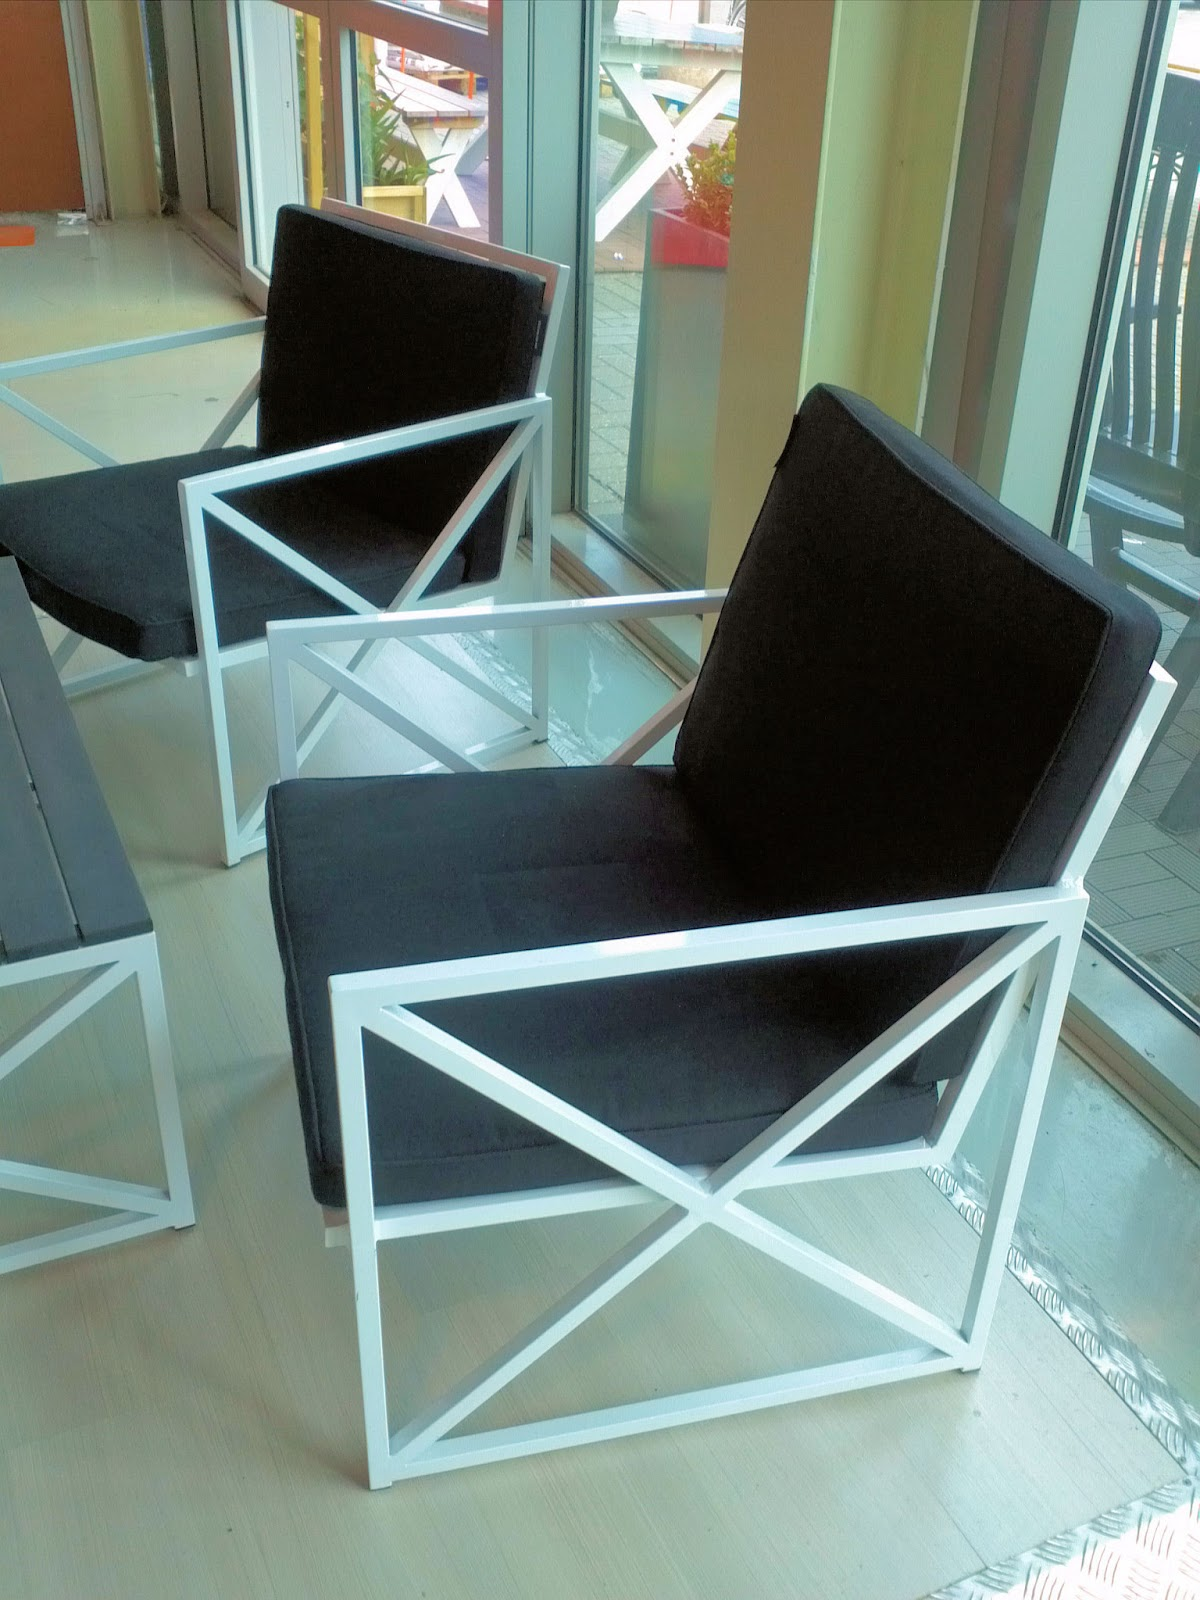 Jan Des Bouvrie Tuinstoelen.Gek Op Zwart Wit Leuke Zwart Wit Lounge Tuinstoelen Van Jan Des